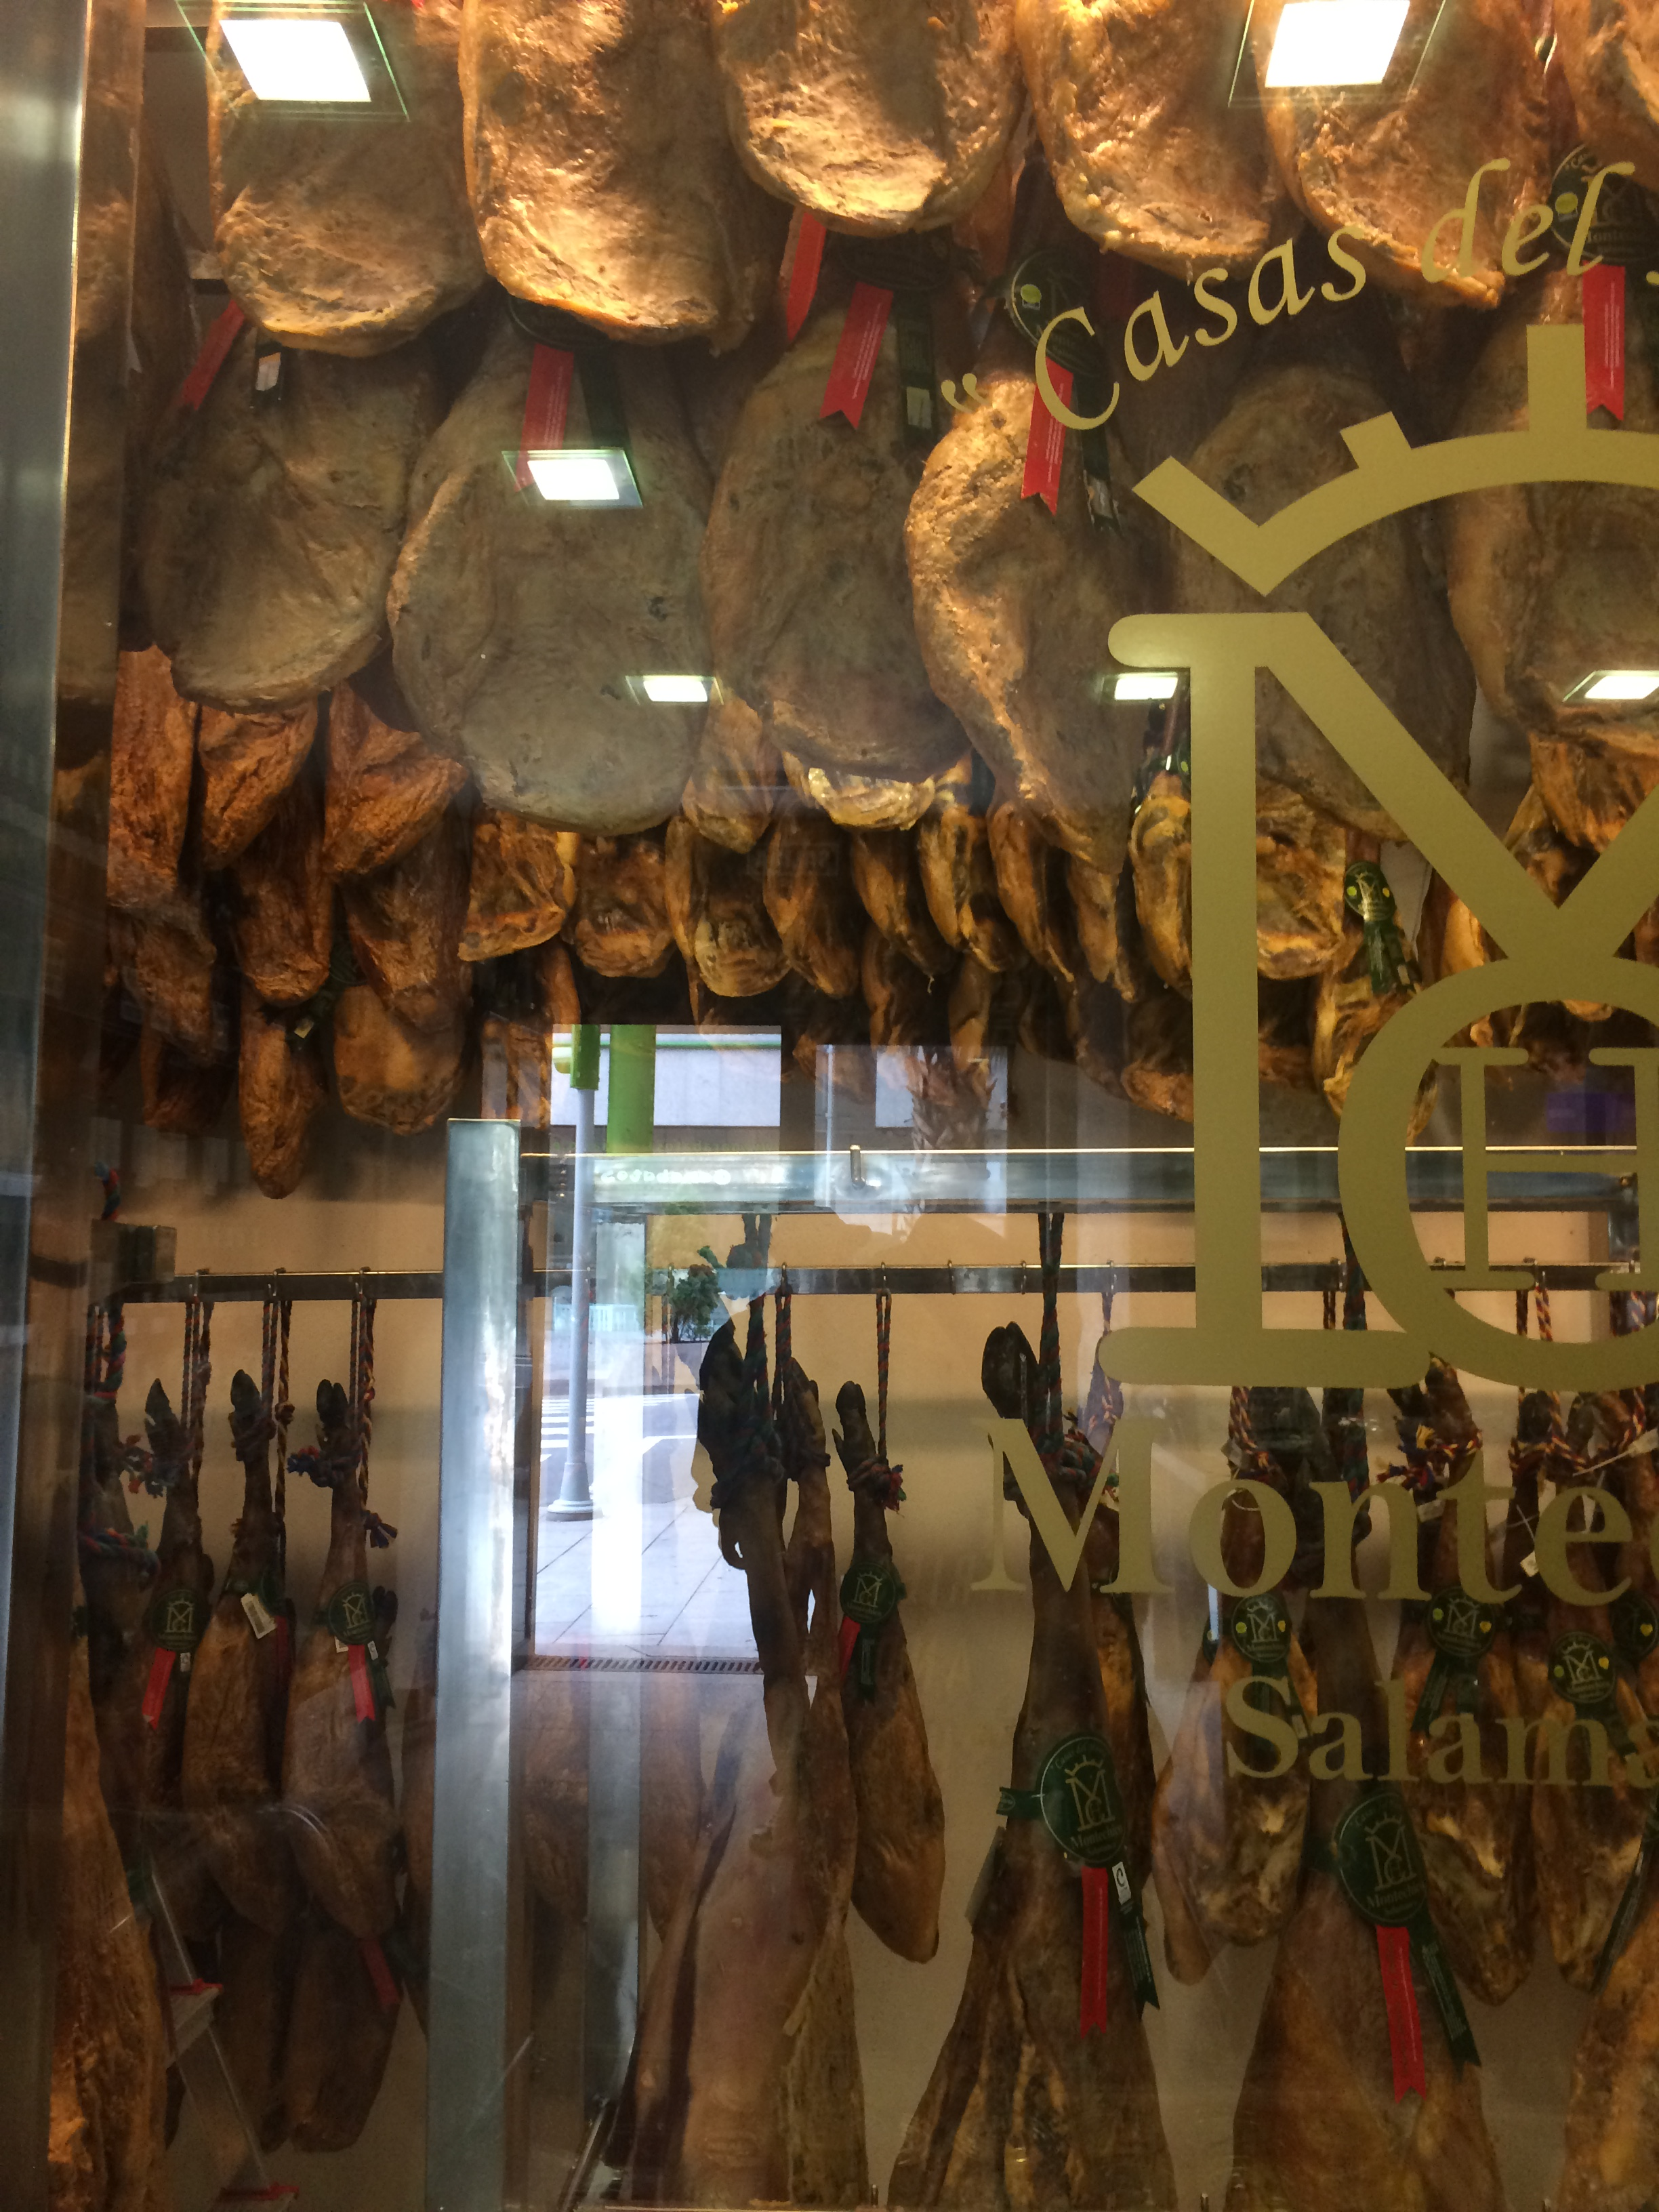 Montechico Gourmet Grocery Store - Vigo, Spain